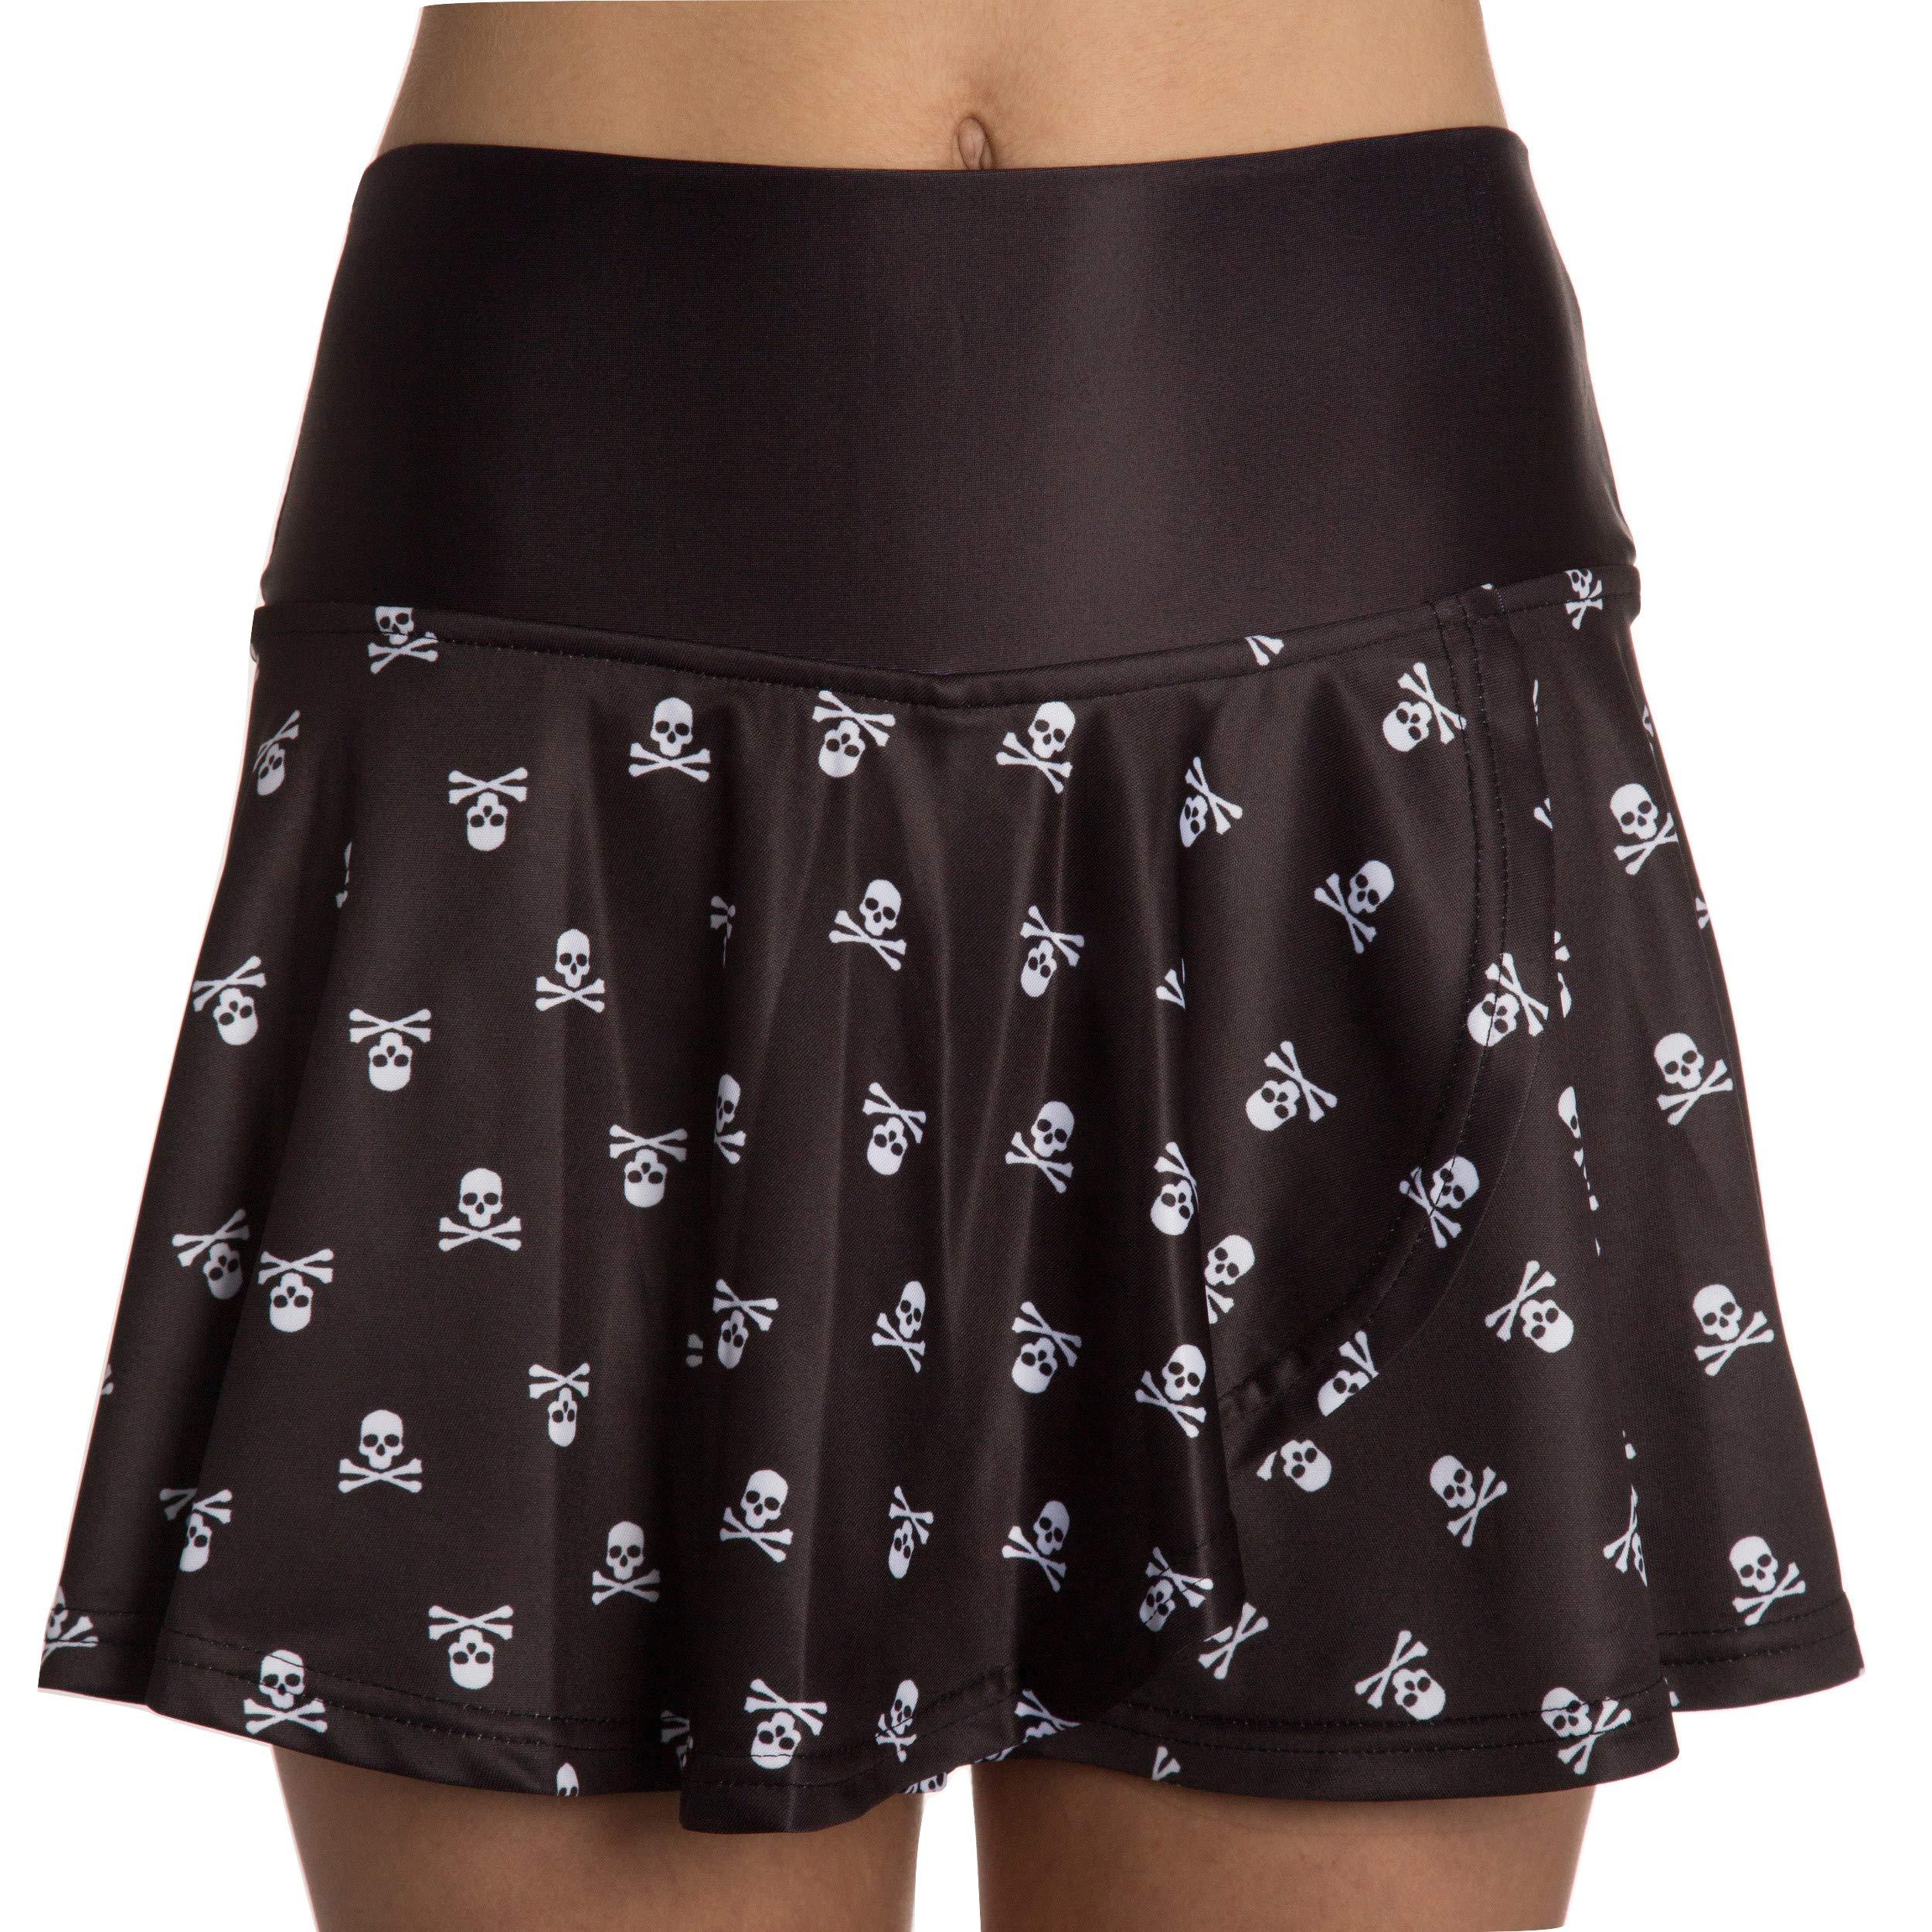 Faye+Florie Holly Tennis Skirt (Skull, X-Small)